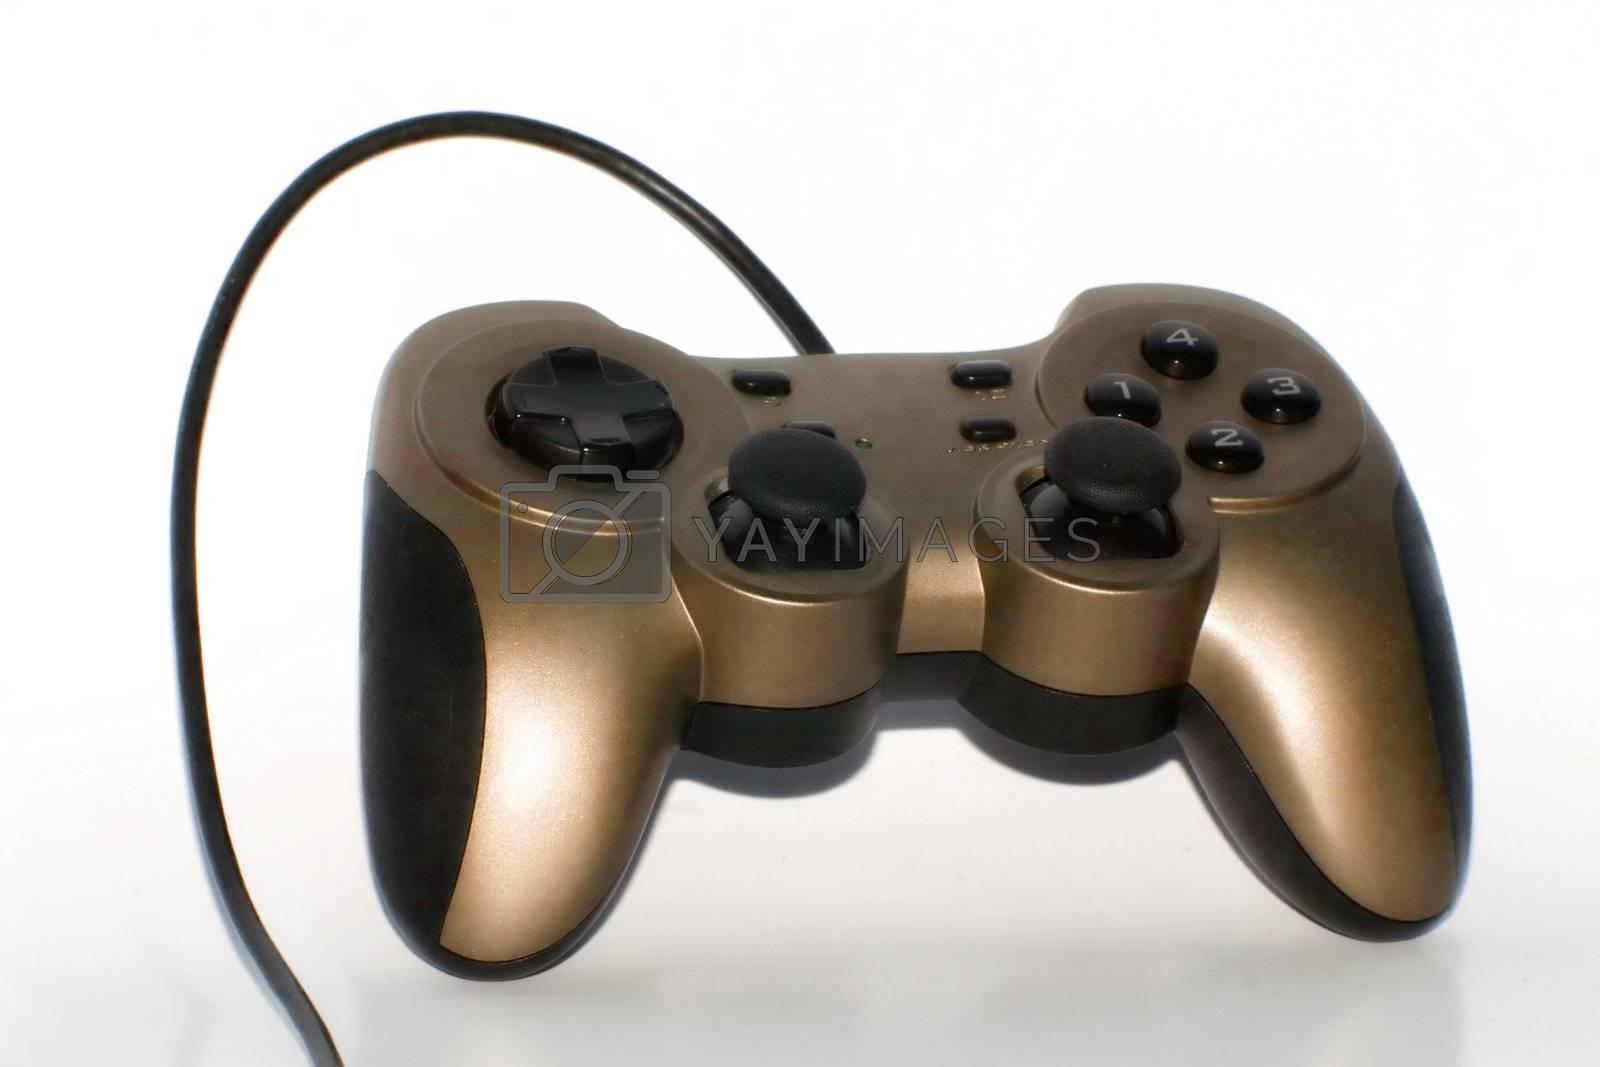 Golden Gamepad on white background